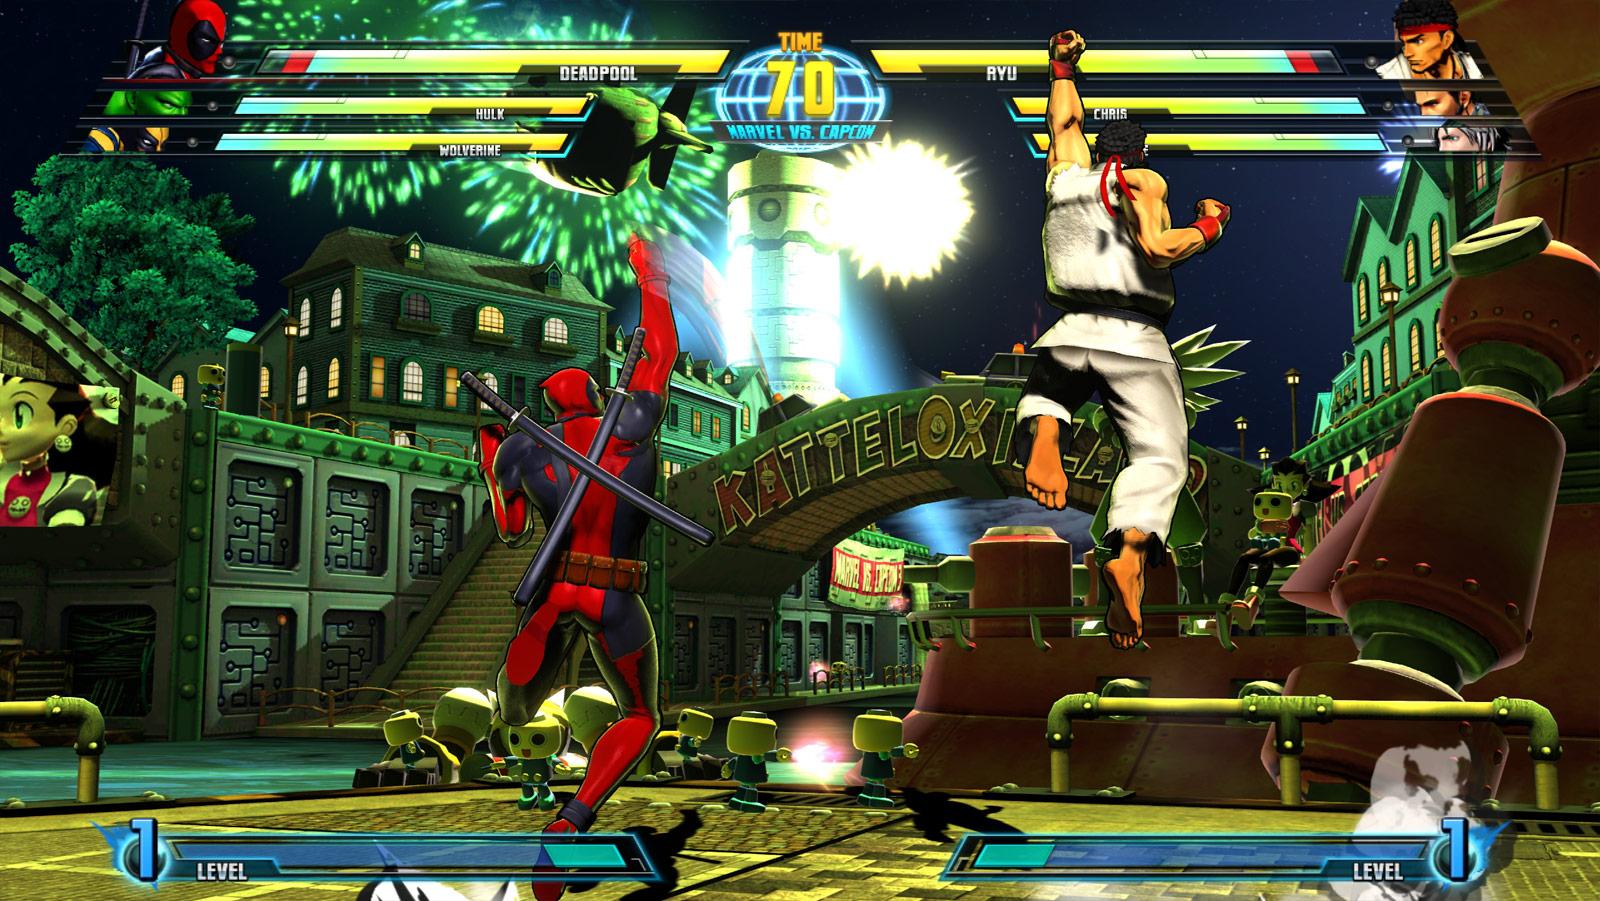 Marvel vs. Capcom 3 screen shot from E3 image #7